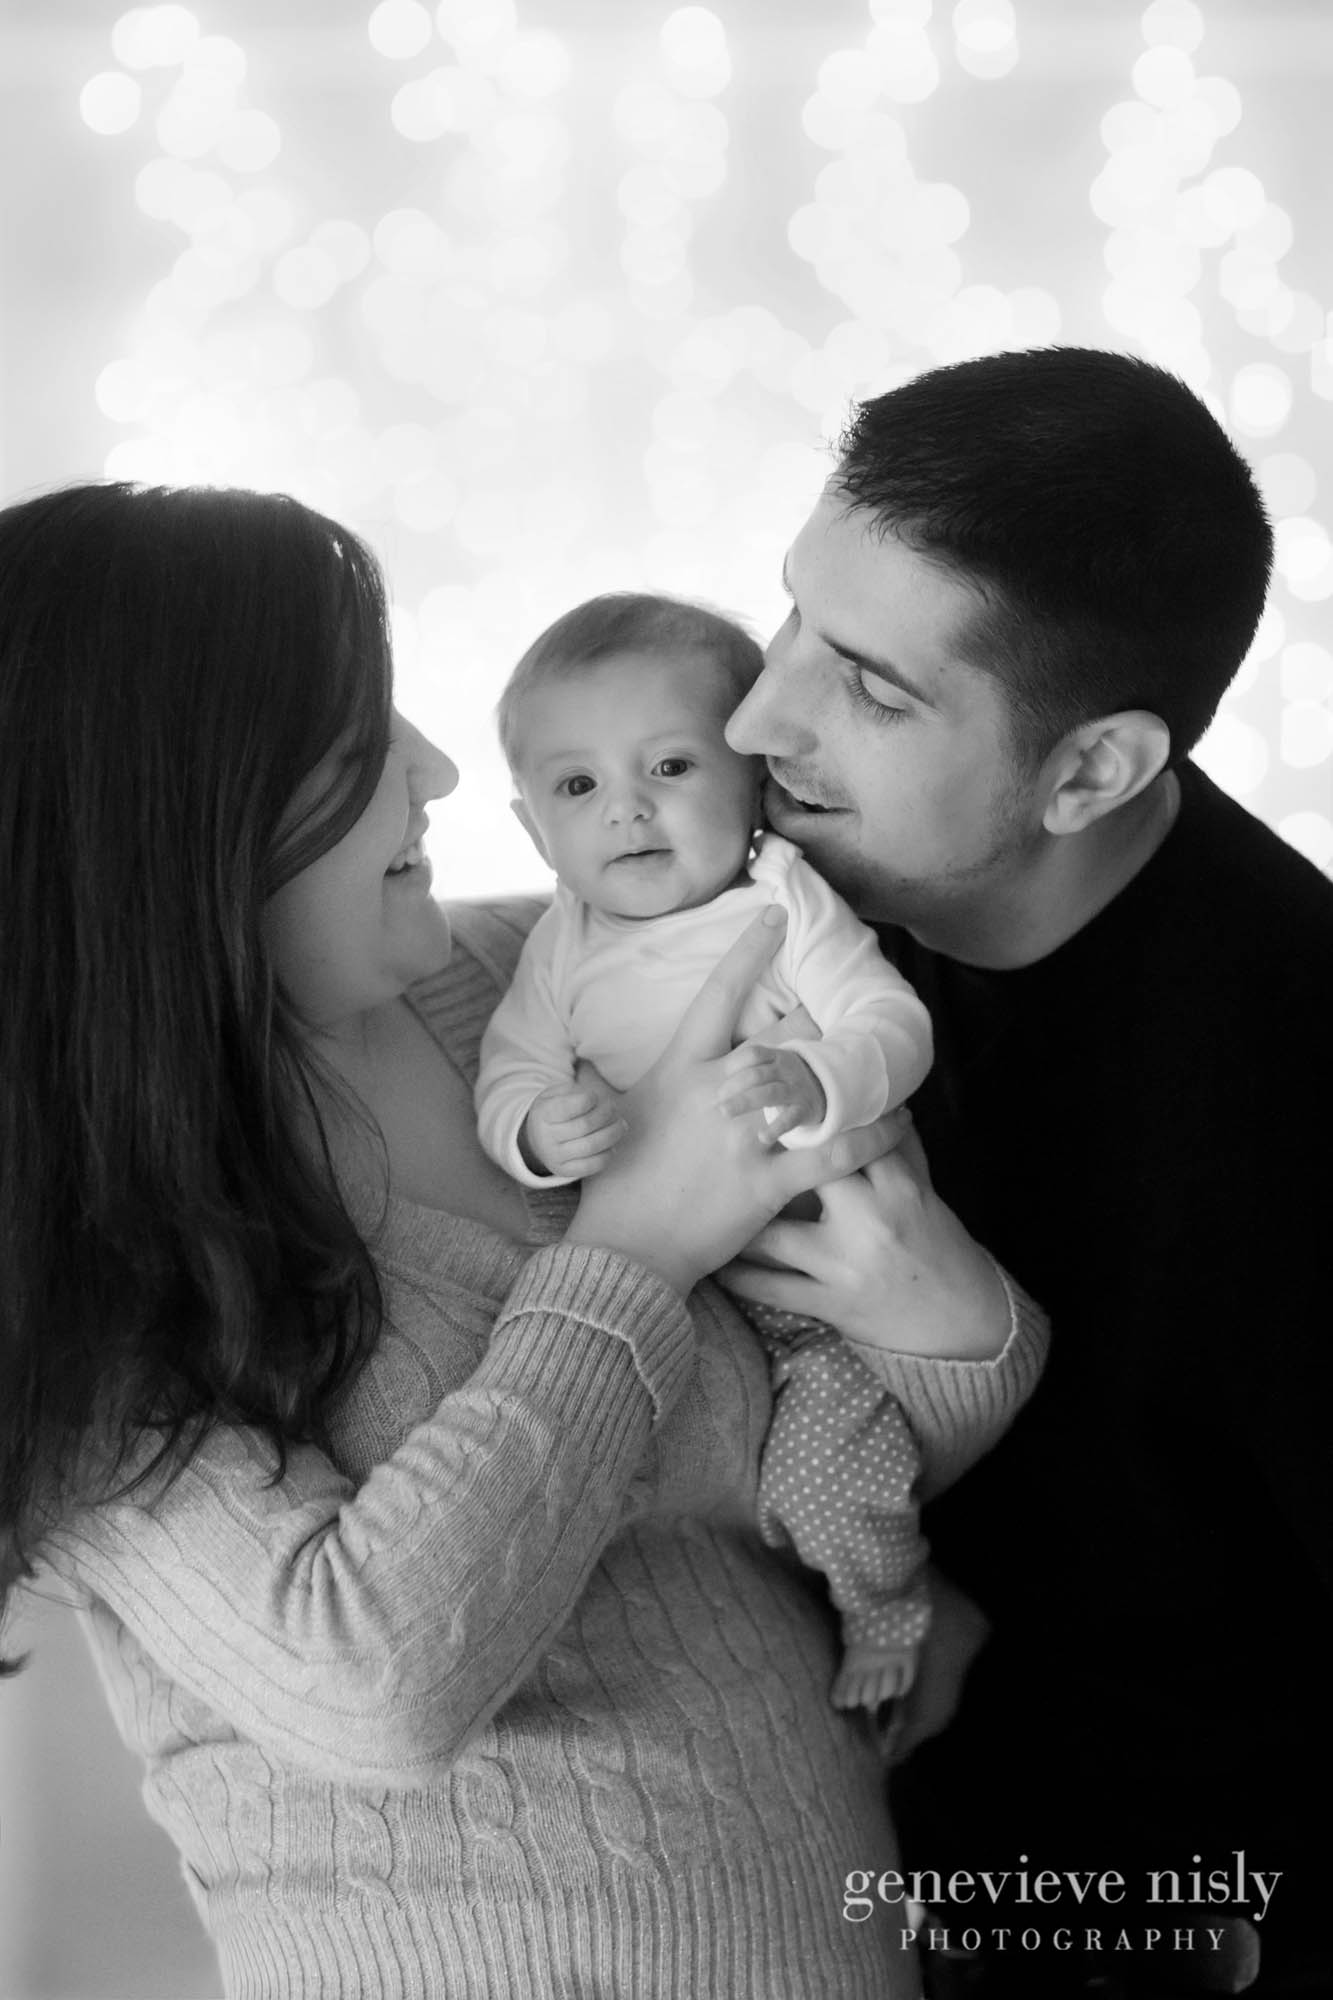 Baby, Copyright Genevieve Nisly Photography, Ohio, Portraits, Winter